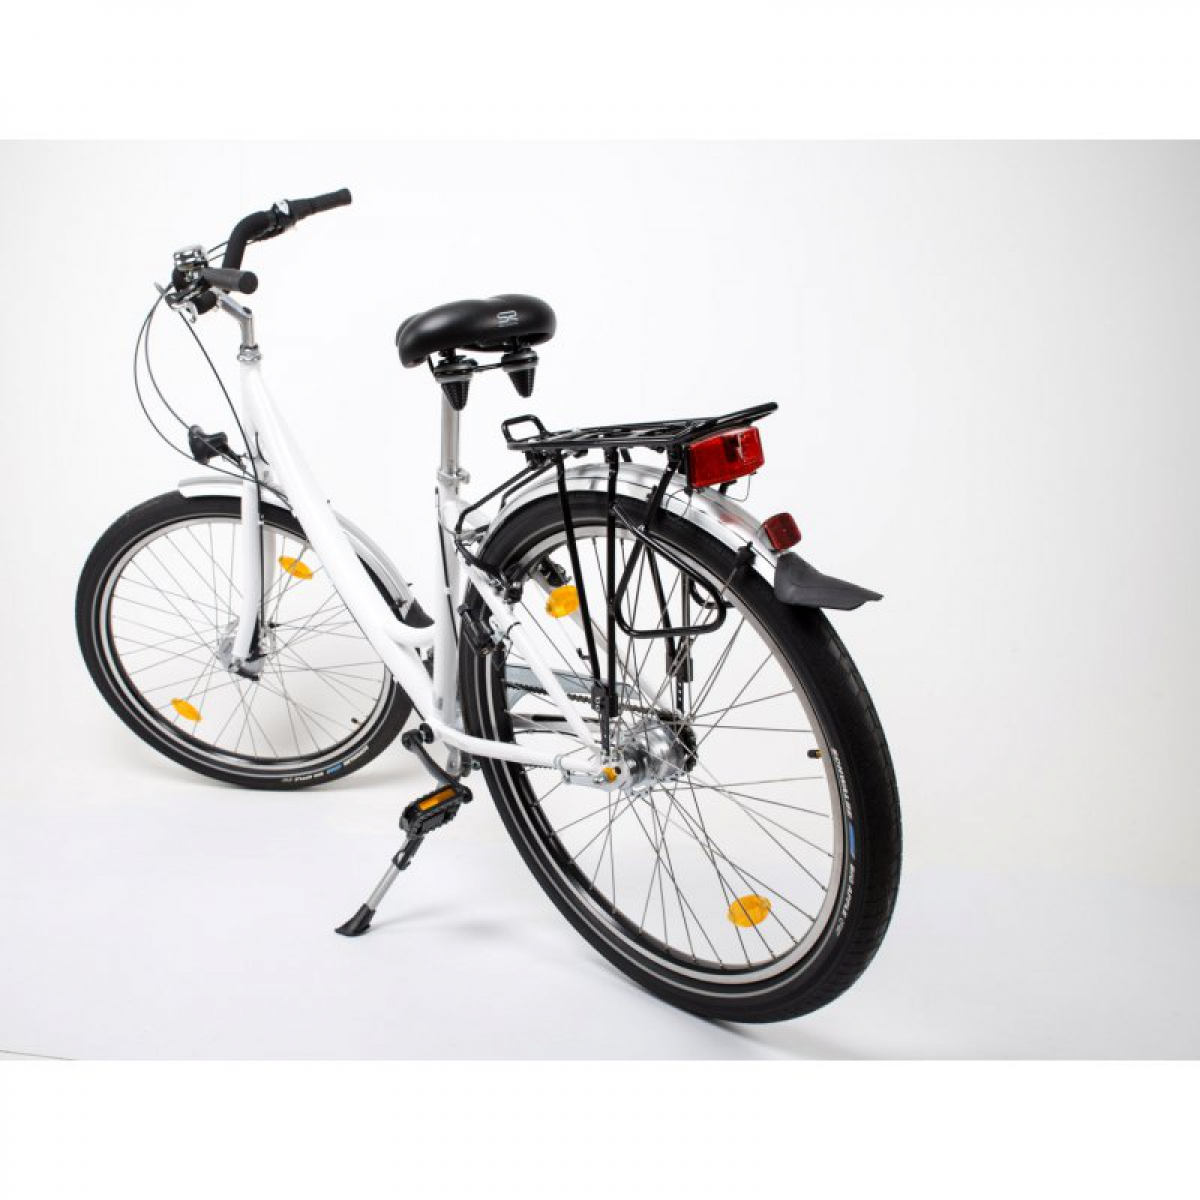 28 zoll damen rad fahrrad city fahrrad rent bike shimano. Black Bedroom Furniture Sets. Home Design Ideas